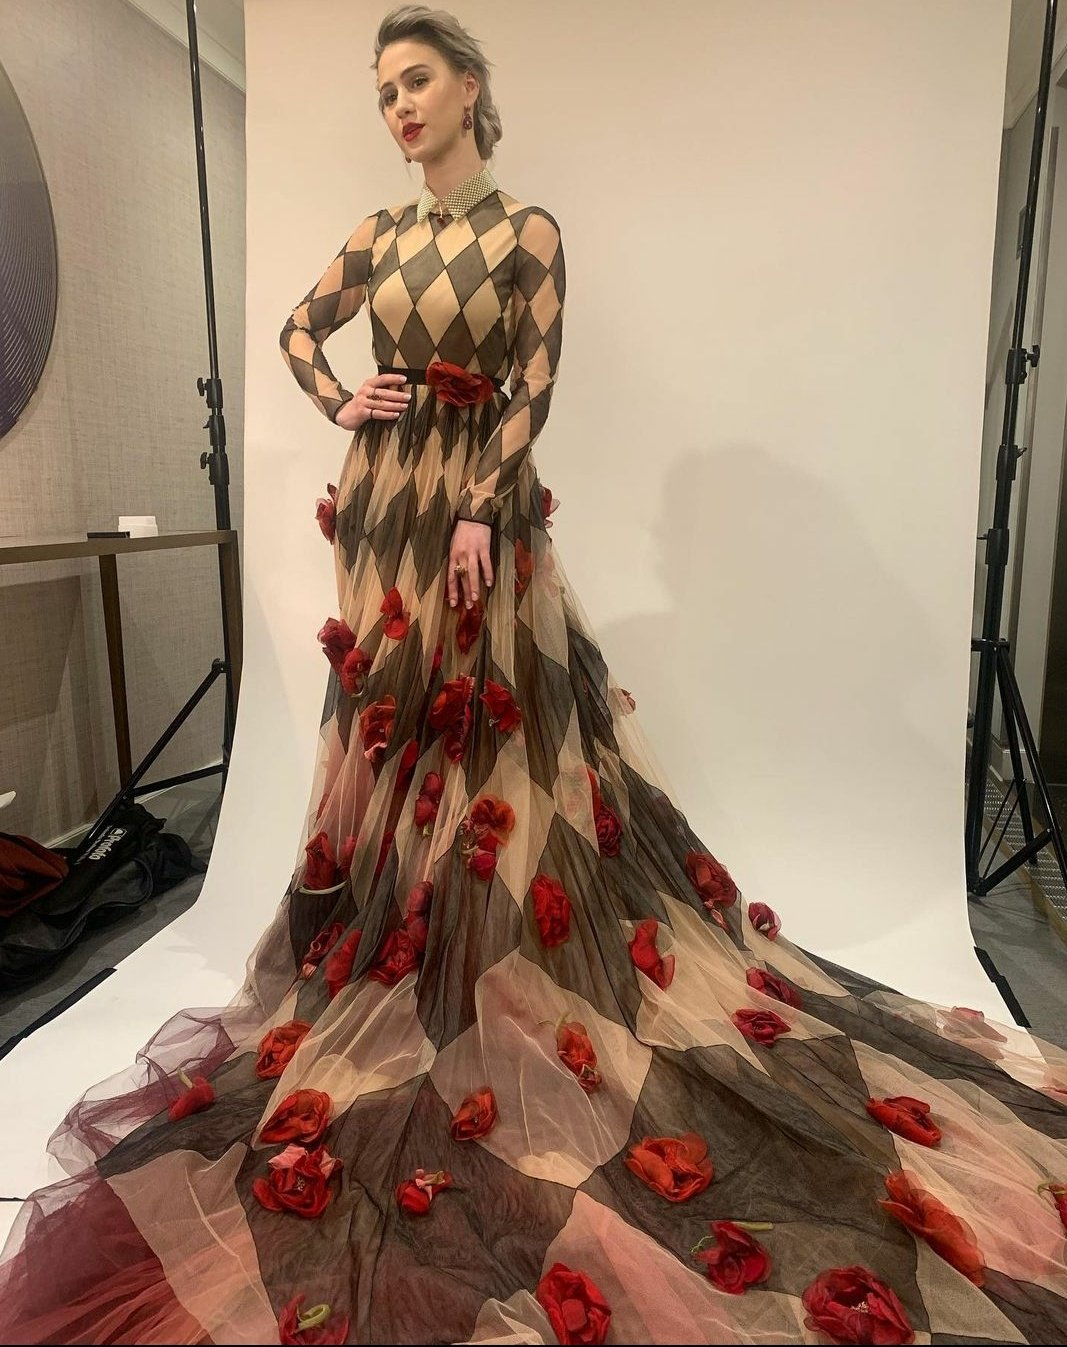 maria-bakalova-wore-dior-2021-sag-awards